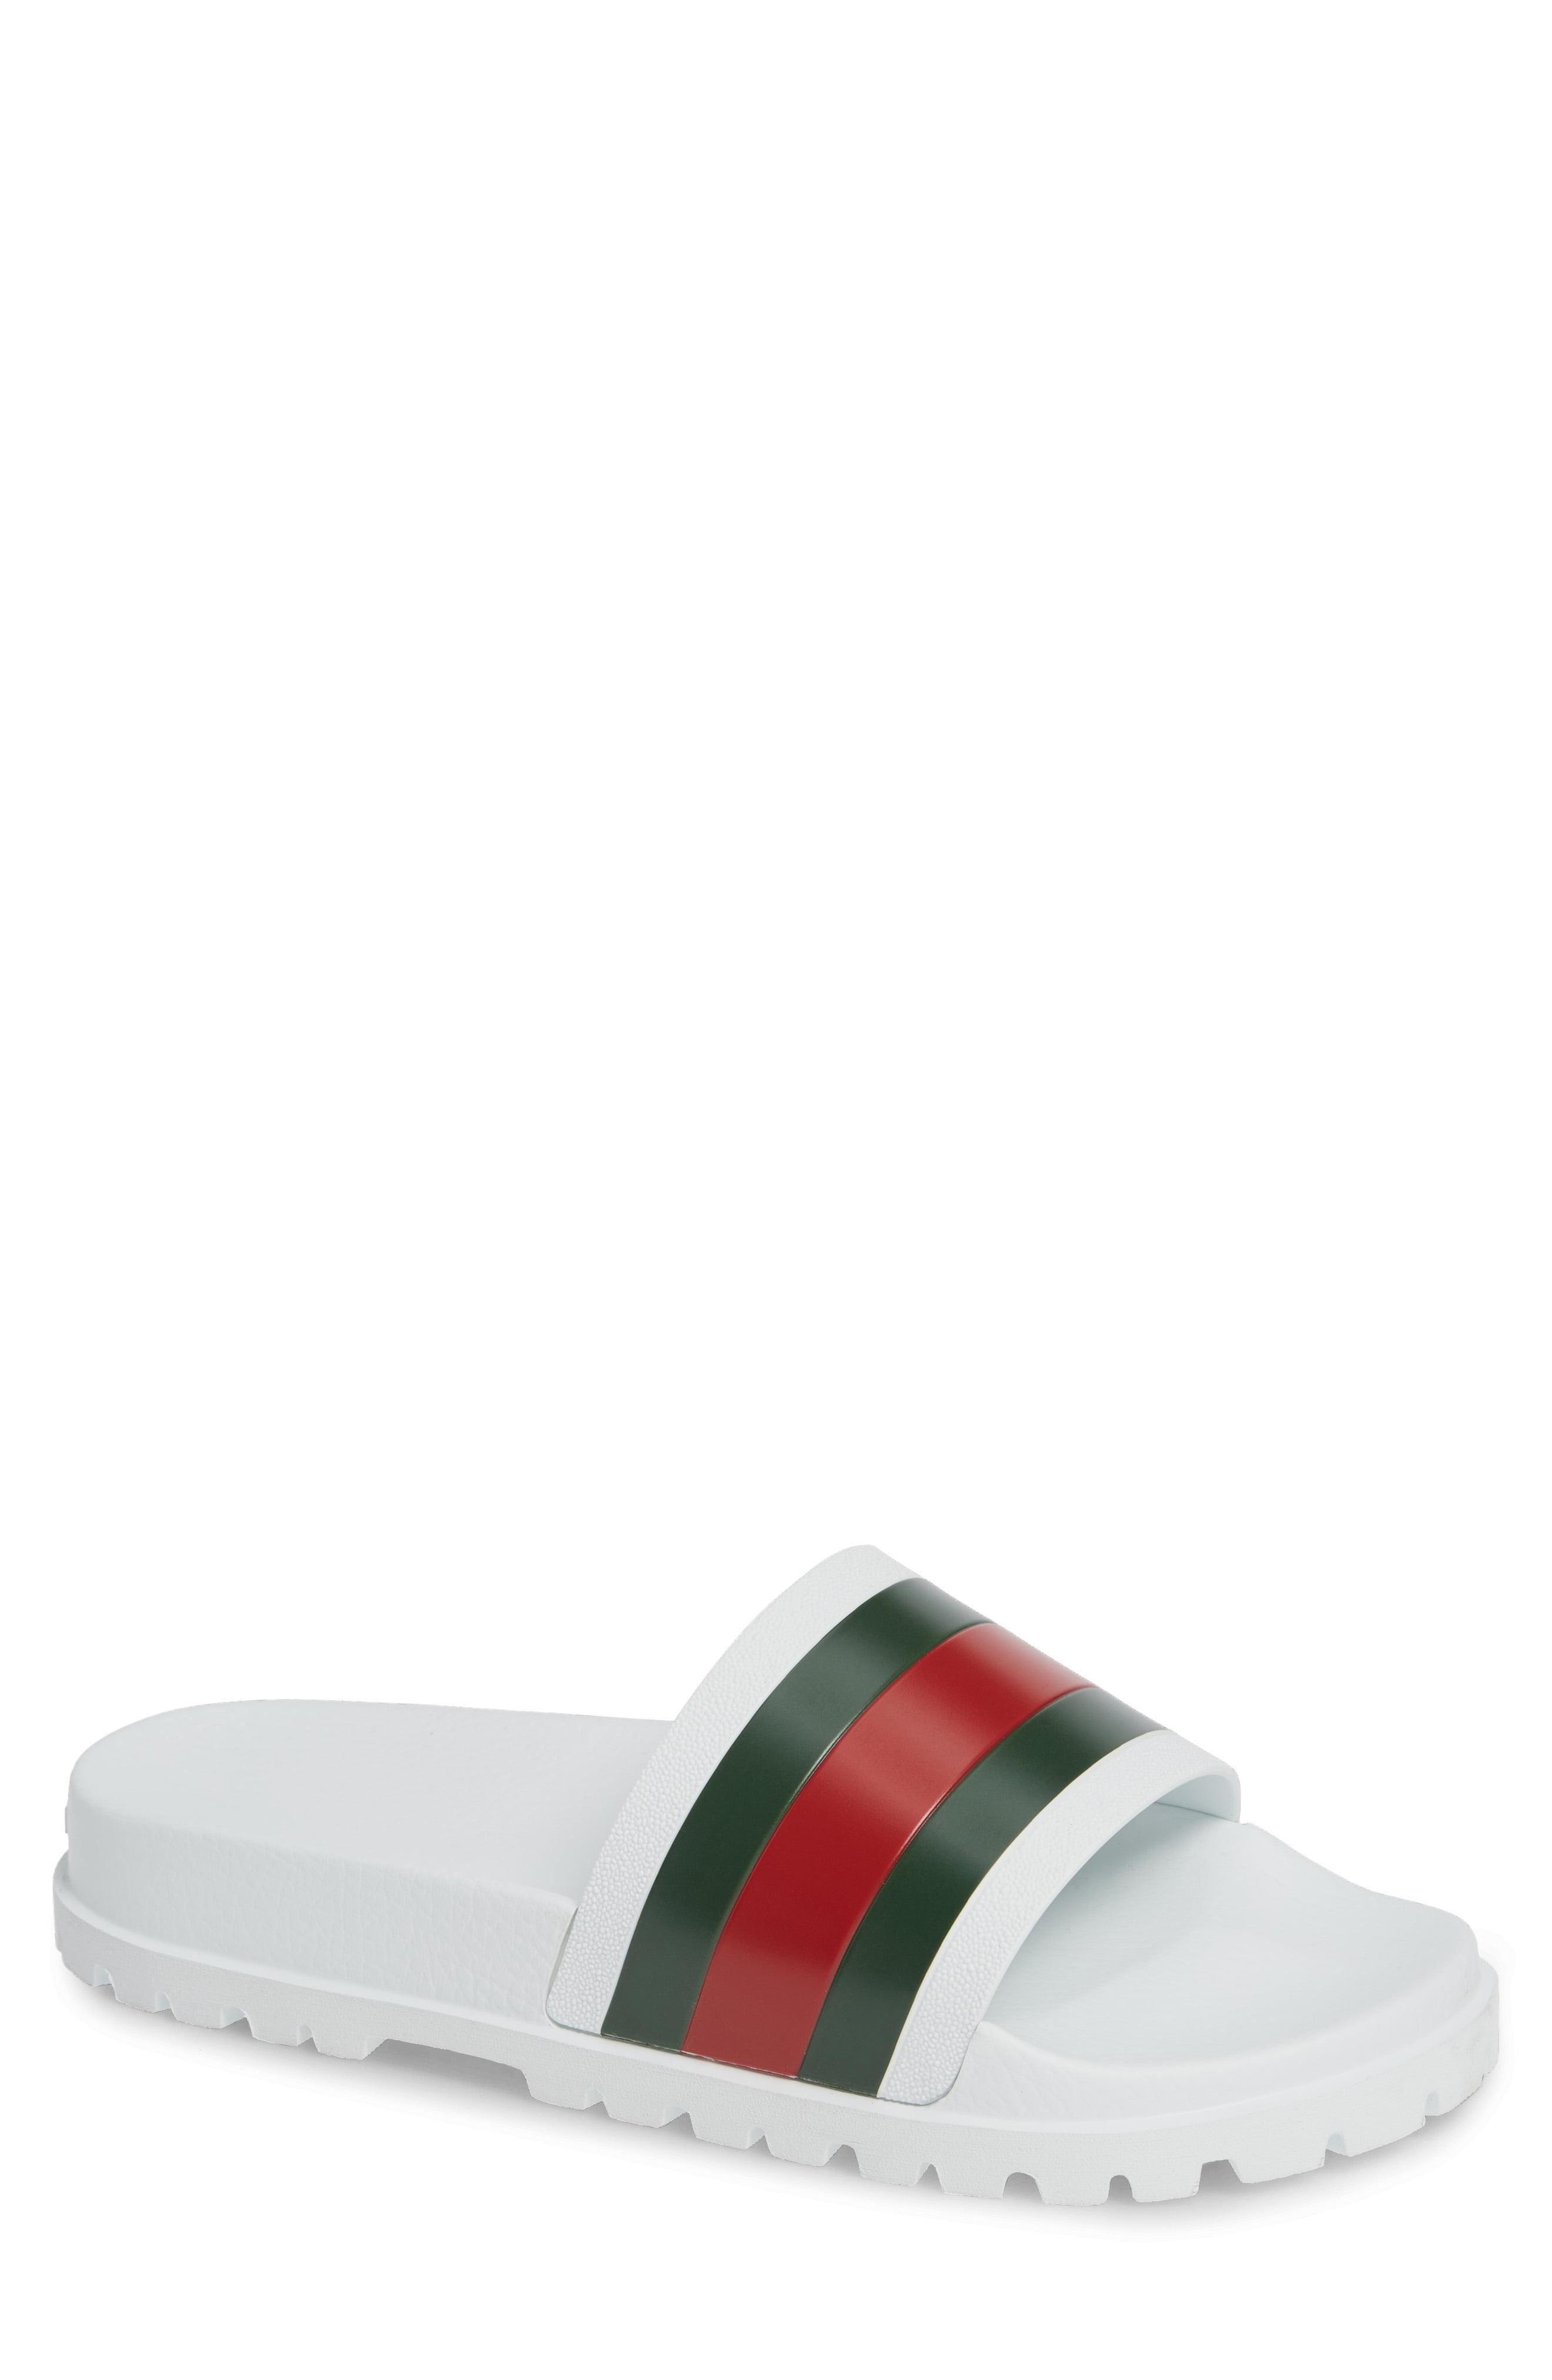 565a8edc1da Lyst - Gucci  pursuit Treck  Slide Sandal in White for Men